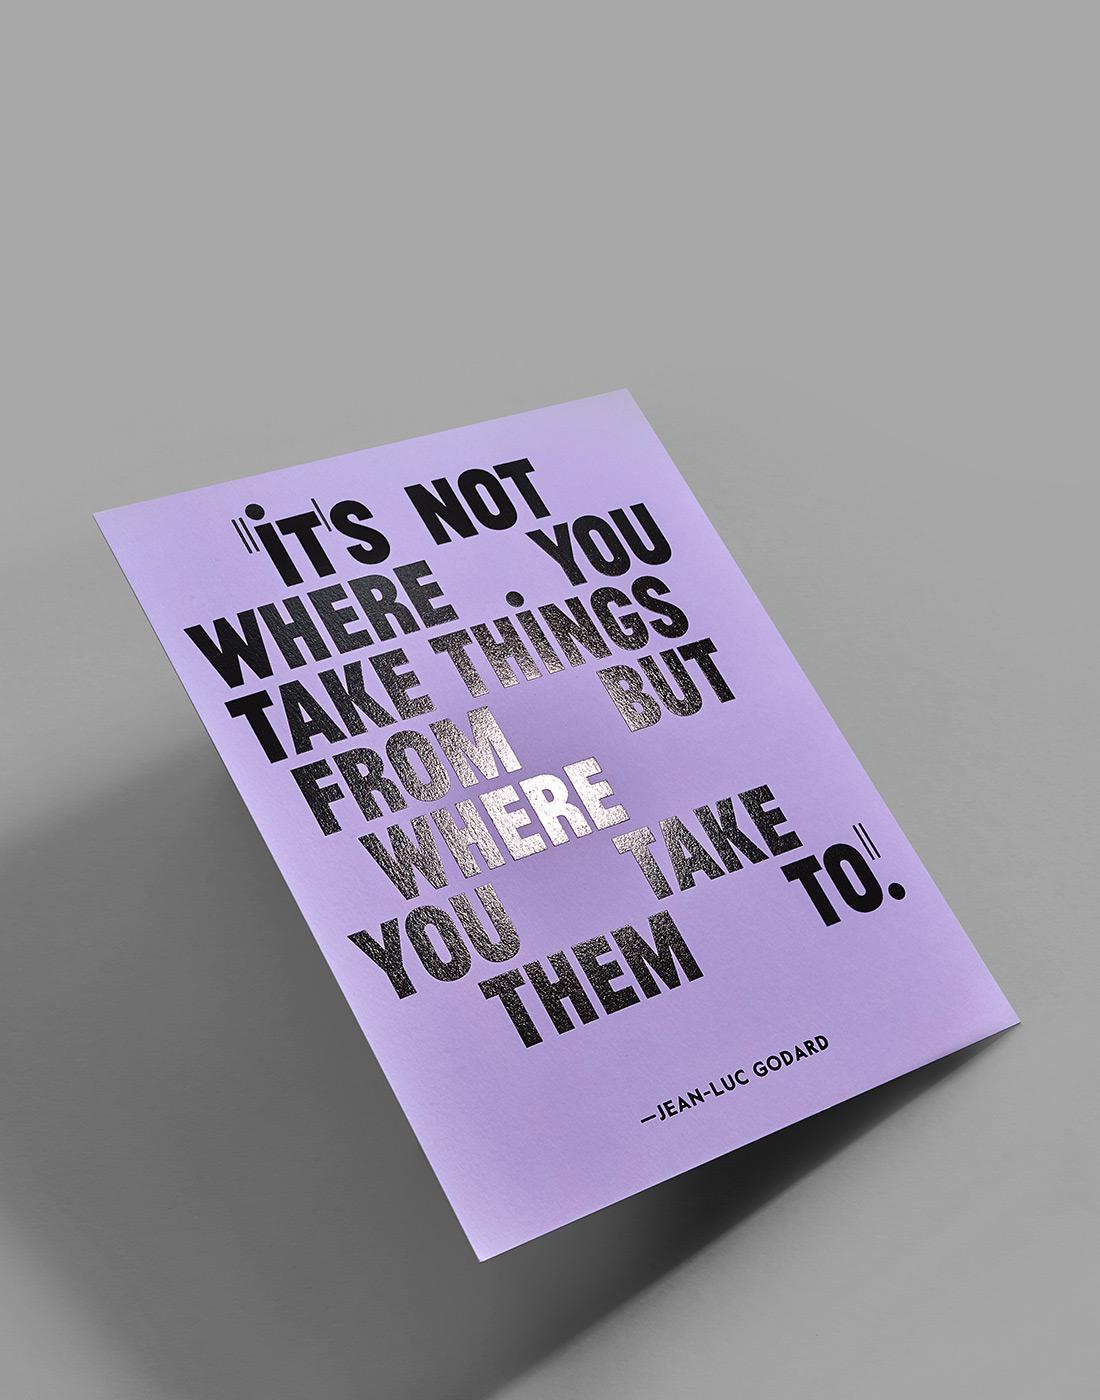 Jean-Luc Godard says ...